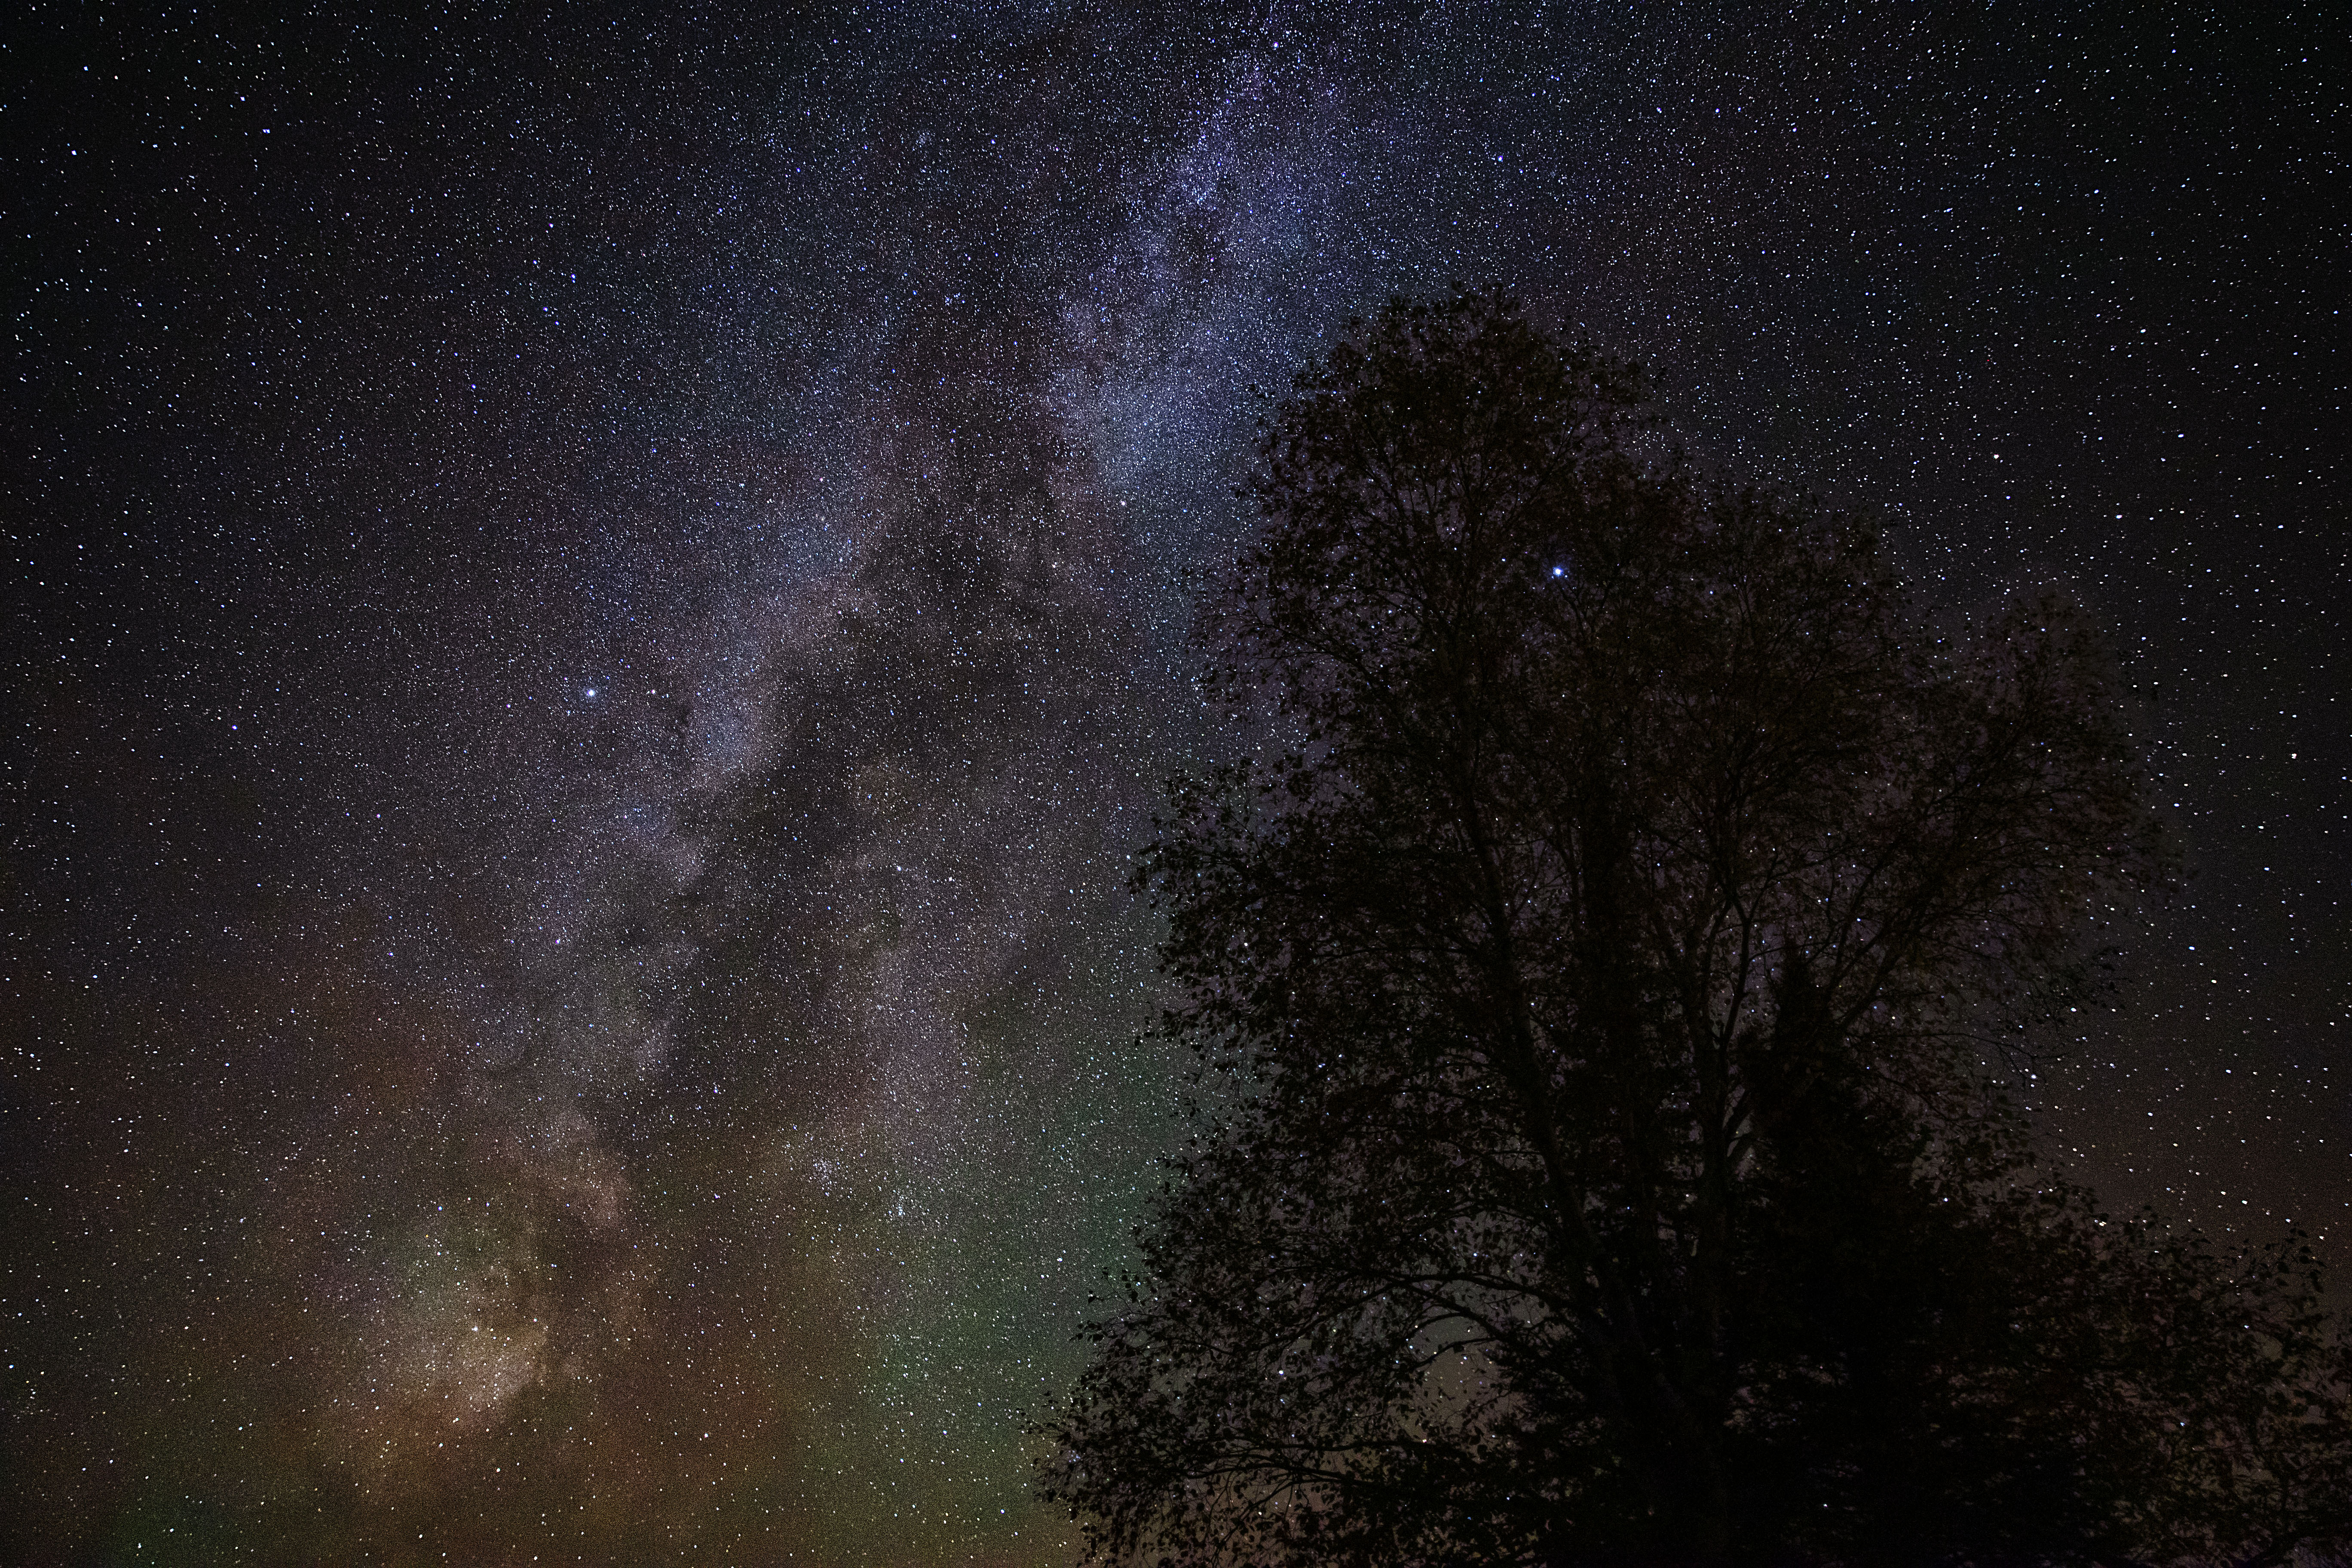 Milky Way over Minnesota